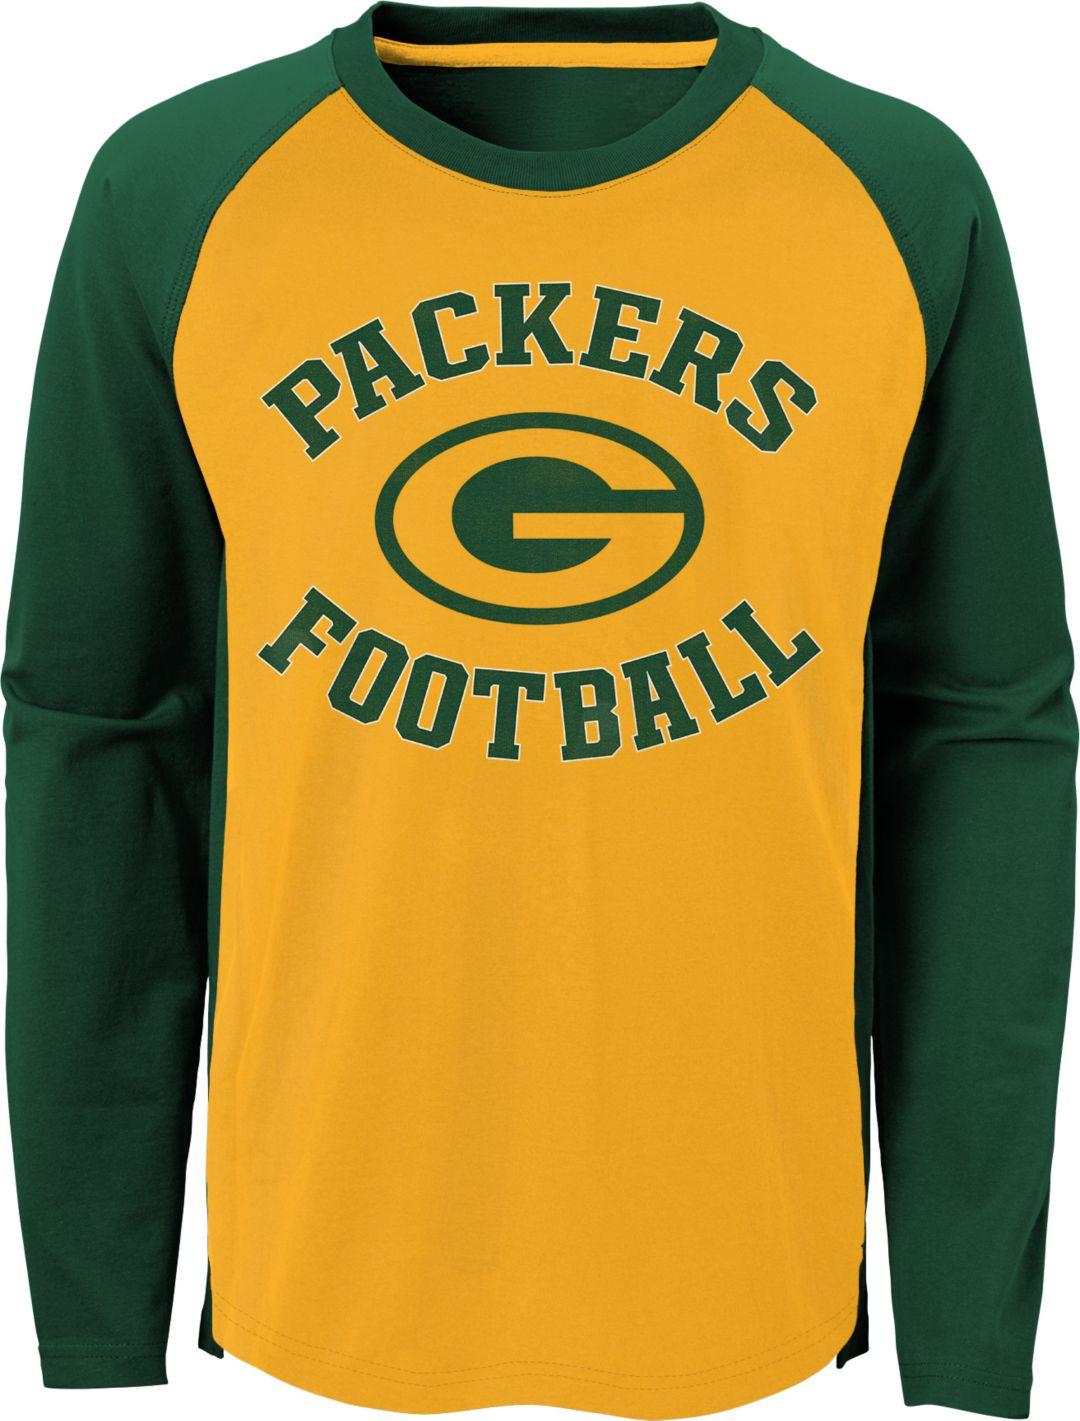 buy popular 821f5 2b612 NFL Team Apparel Youth Green Bay Packers Air Raid Long Sleeve Green Shirt